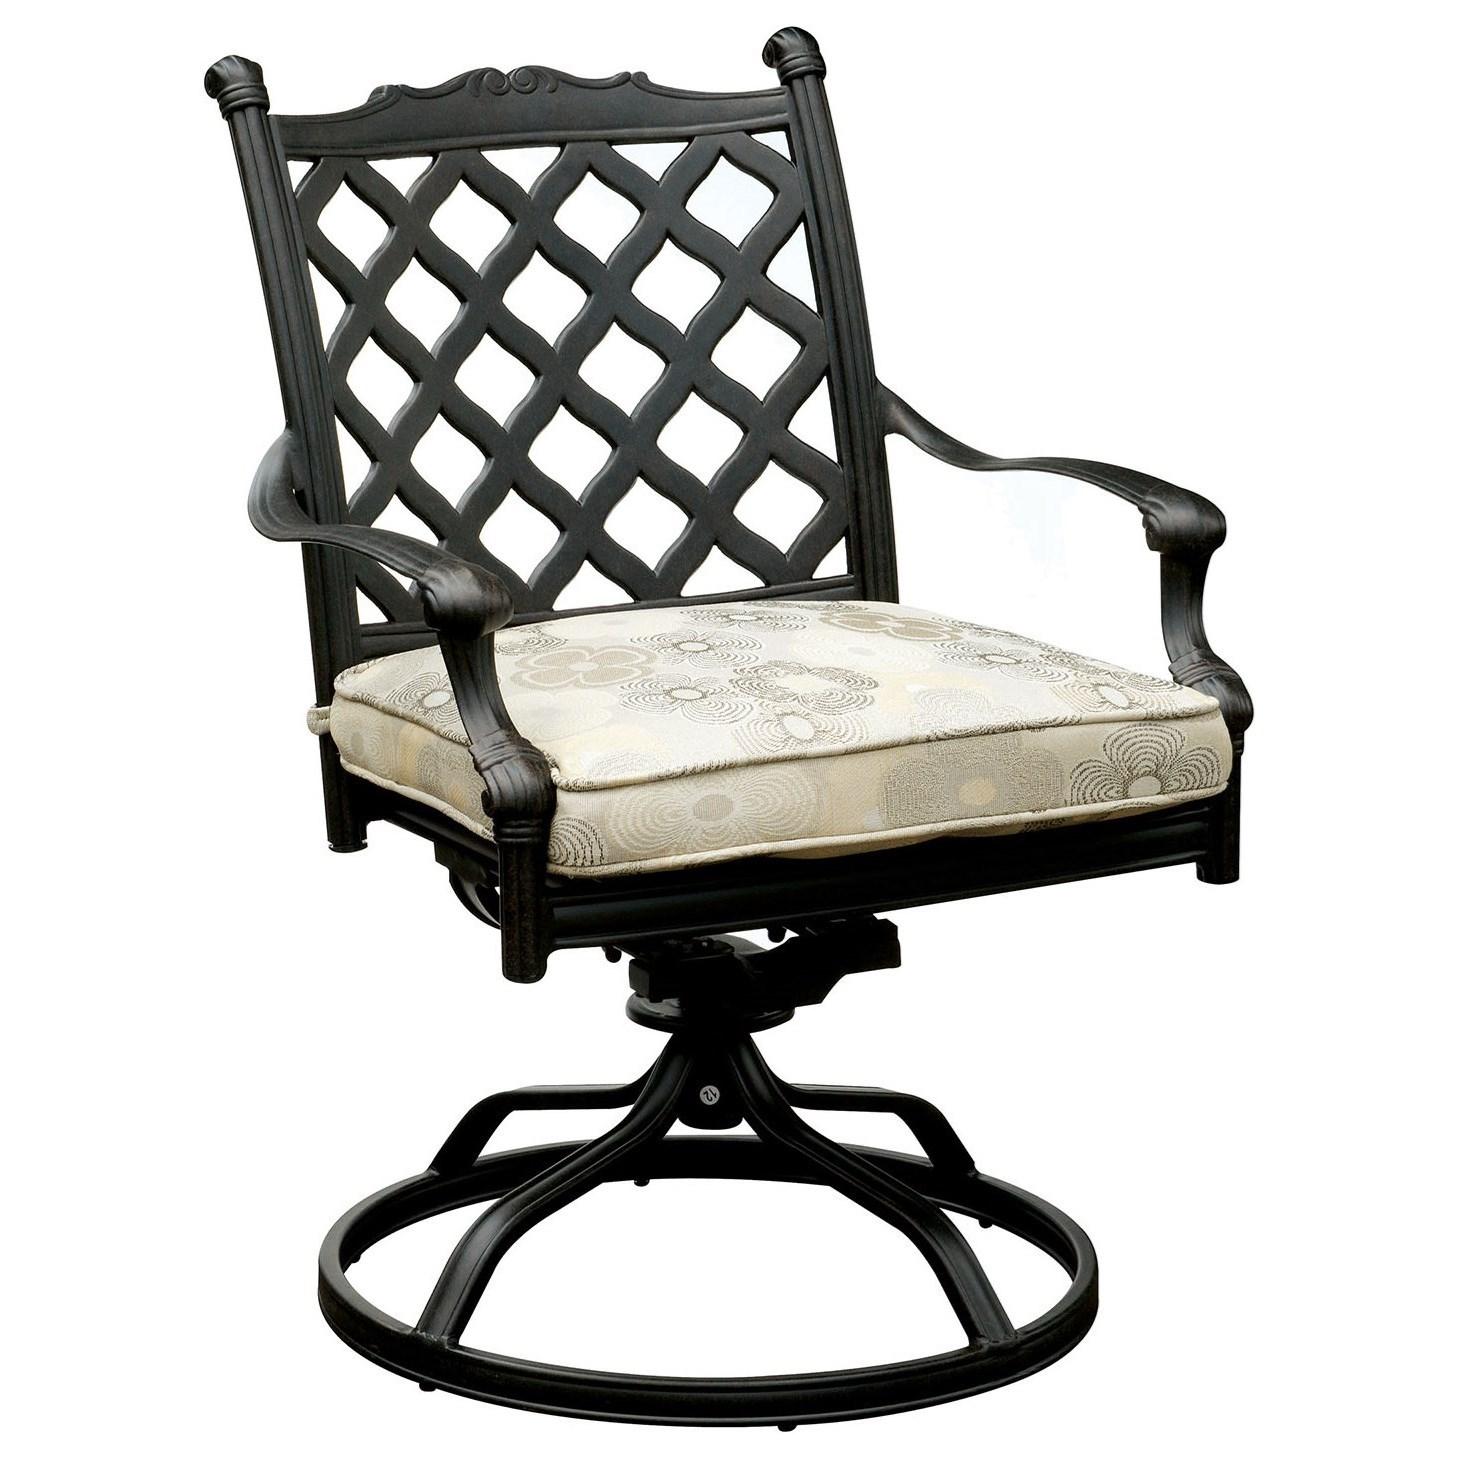 Chiara I Set of 2 Swivel Rocker Chair, Cushion by Furniture of America at Nassau Furniture and Mattress